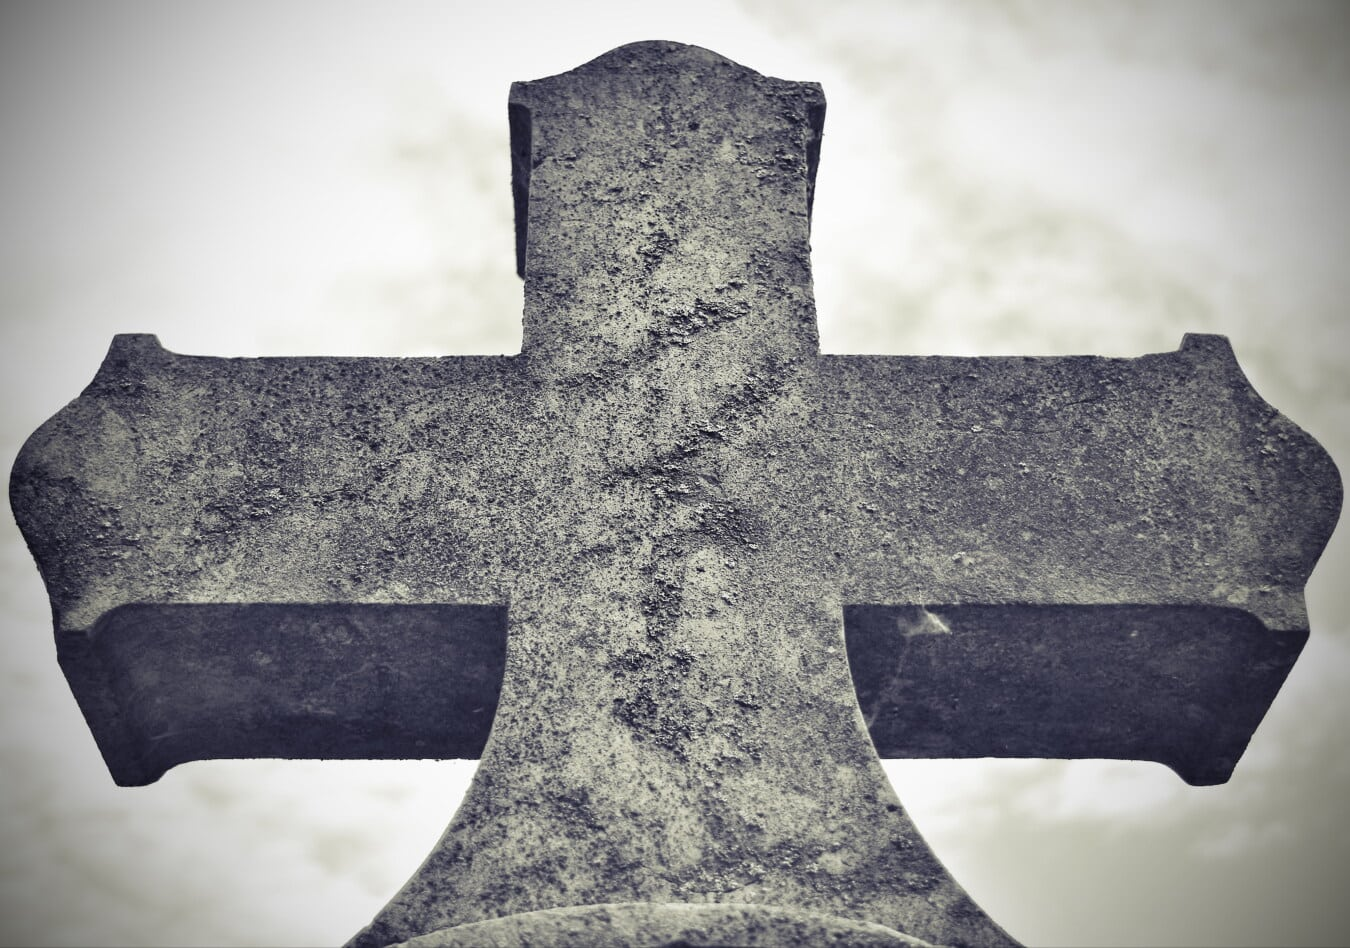 catholic, celtic style, cross, grief, black and white, death, gravestone, close-up, monochrome, cemetery